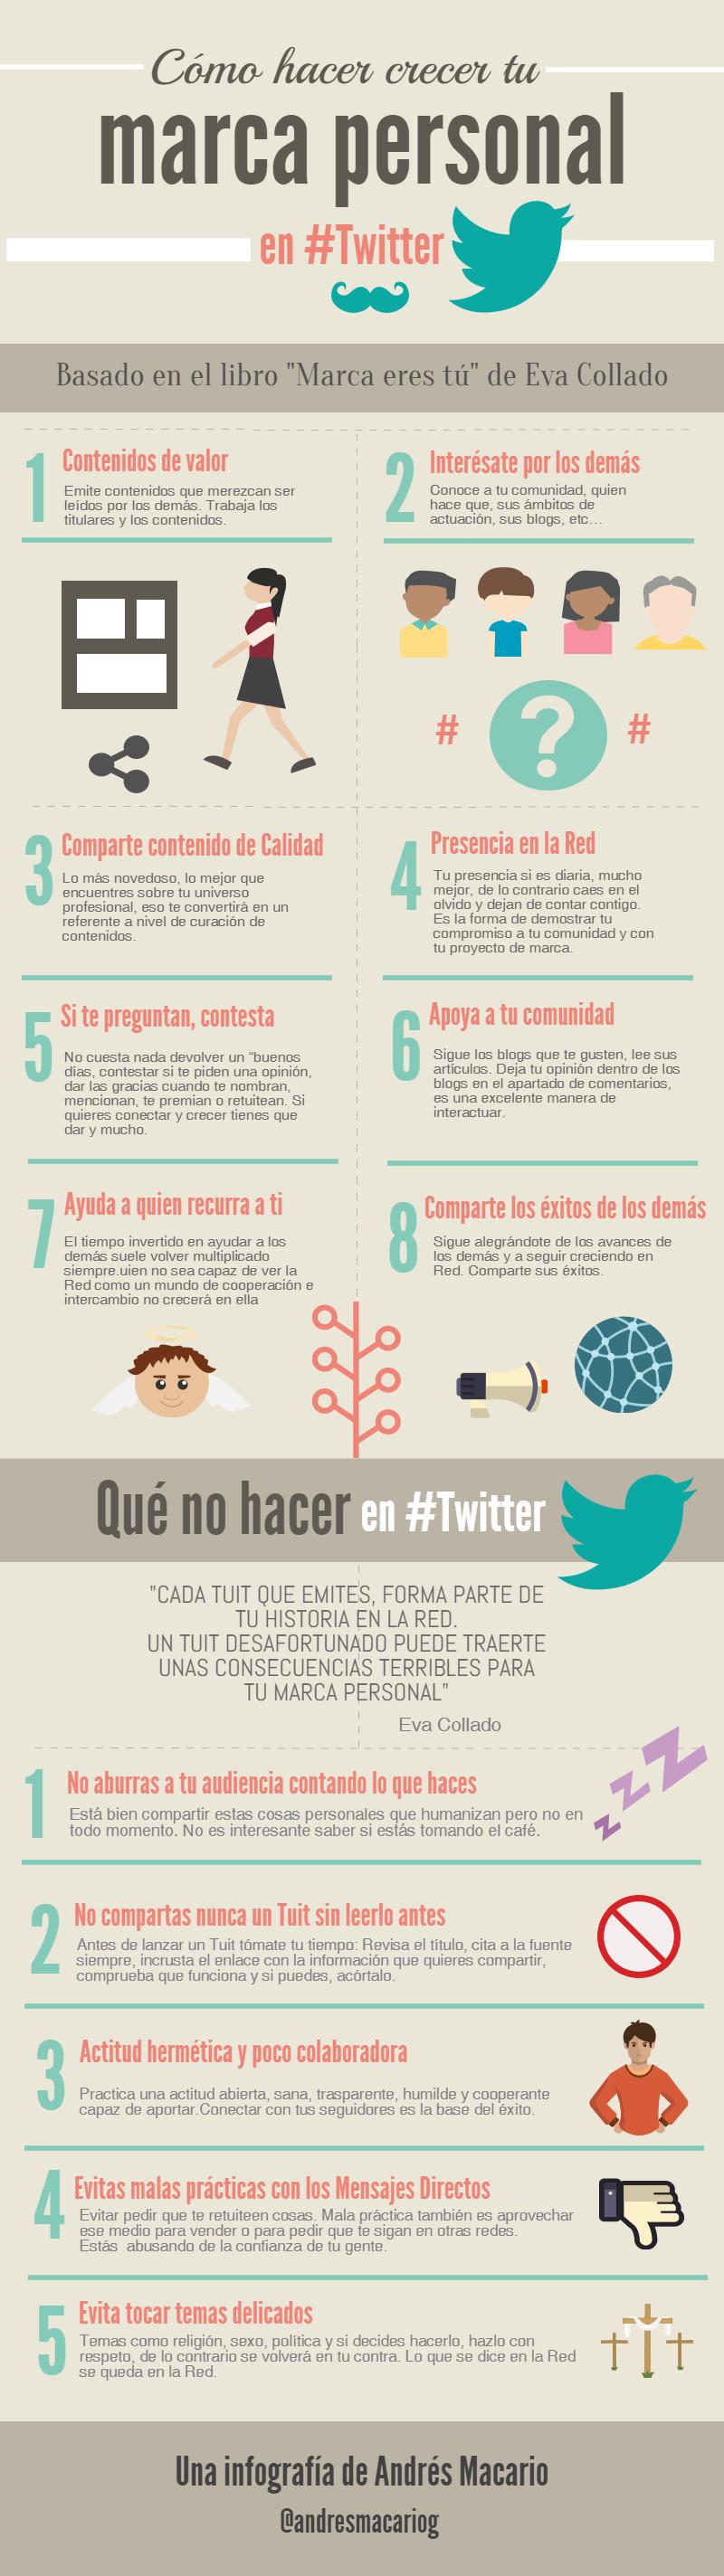 Como hacer crecer tu marca personal en Twitter - infografia Andres Macario